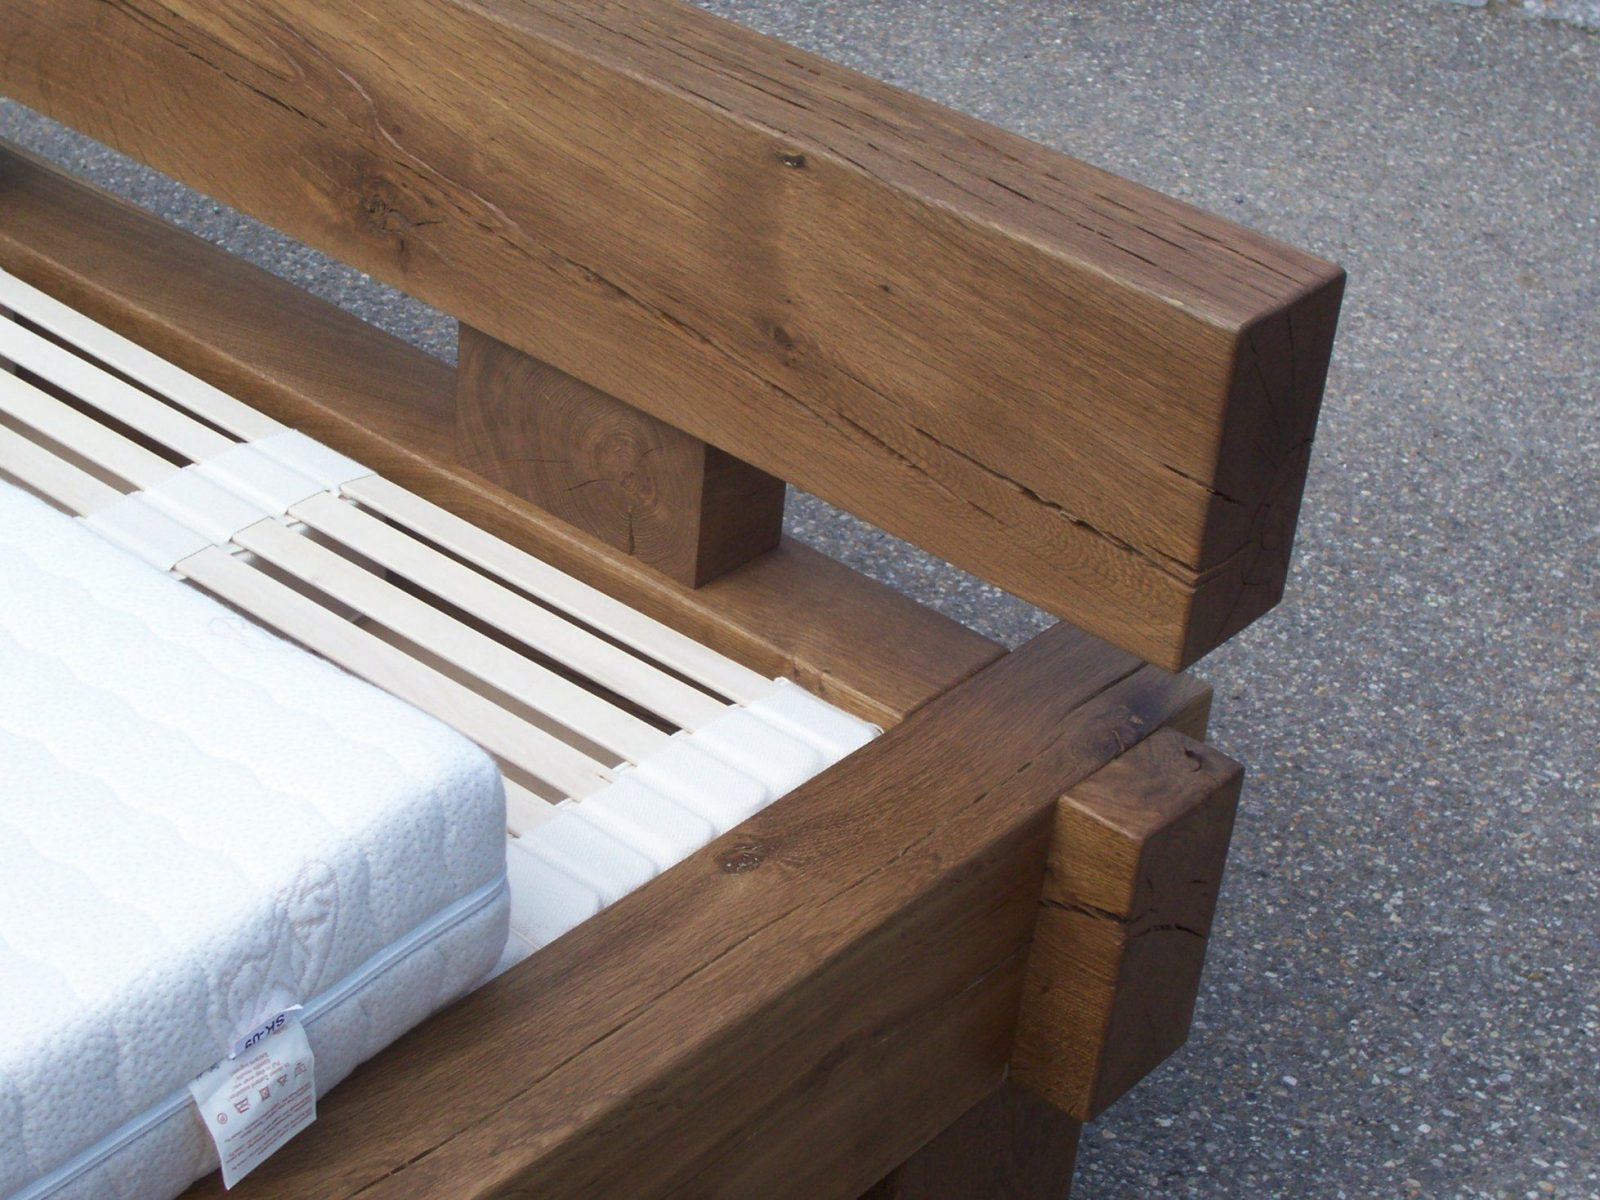 Blox Bett Bauhaus Mit Massivholz Bett Selber Bauen Anleitung Lo31 von Massivholz Bett Selber Bauen Bild